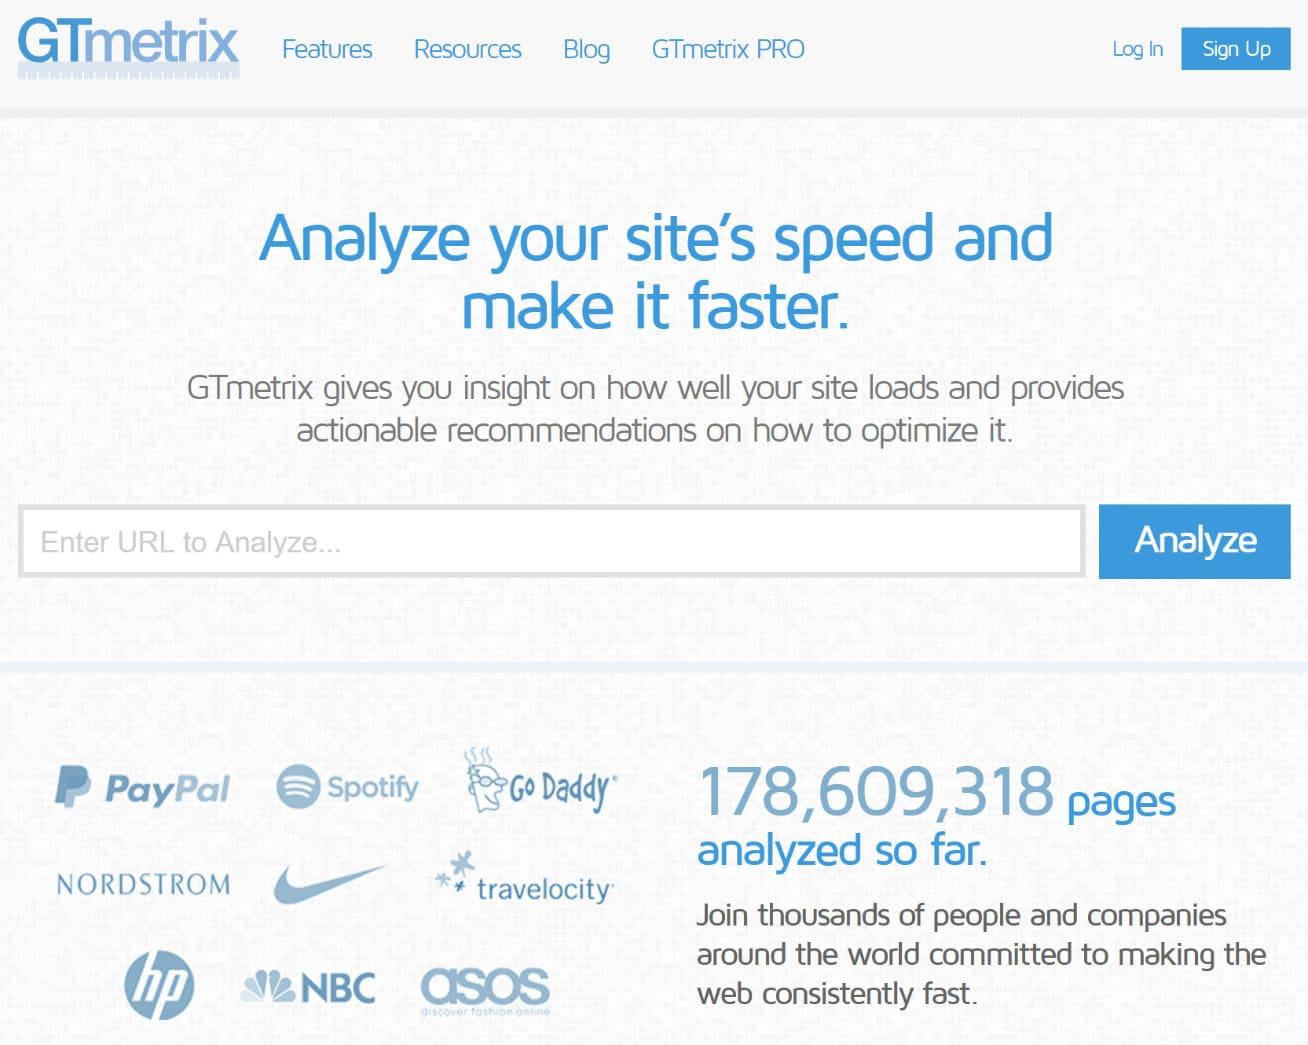 GTmetrix website snelheidstest hulpmiddel